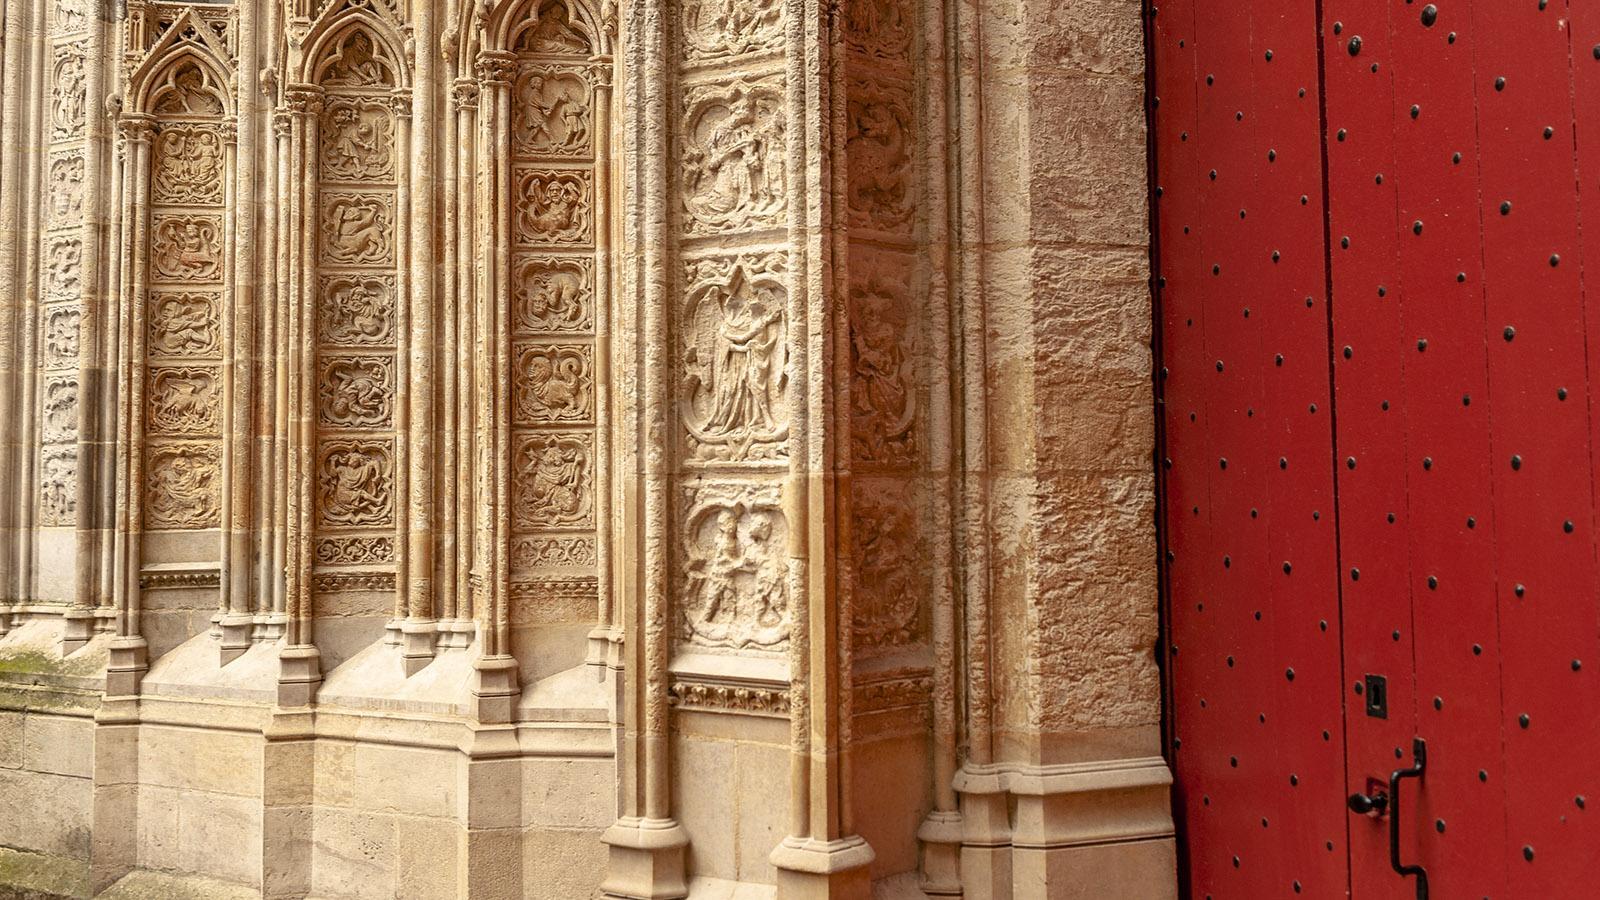 Rouen: Kathedrale, Seiteneingang. Foto: Hilke maunder